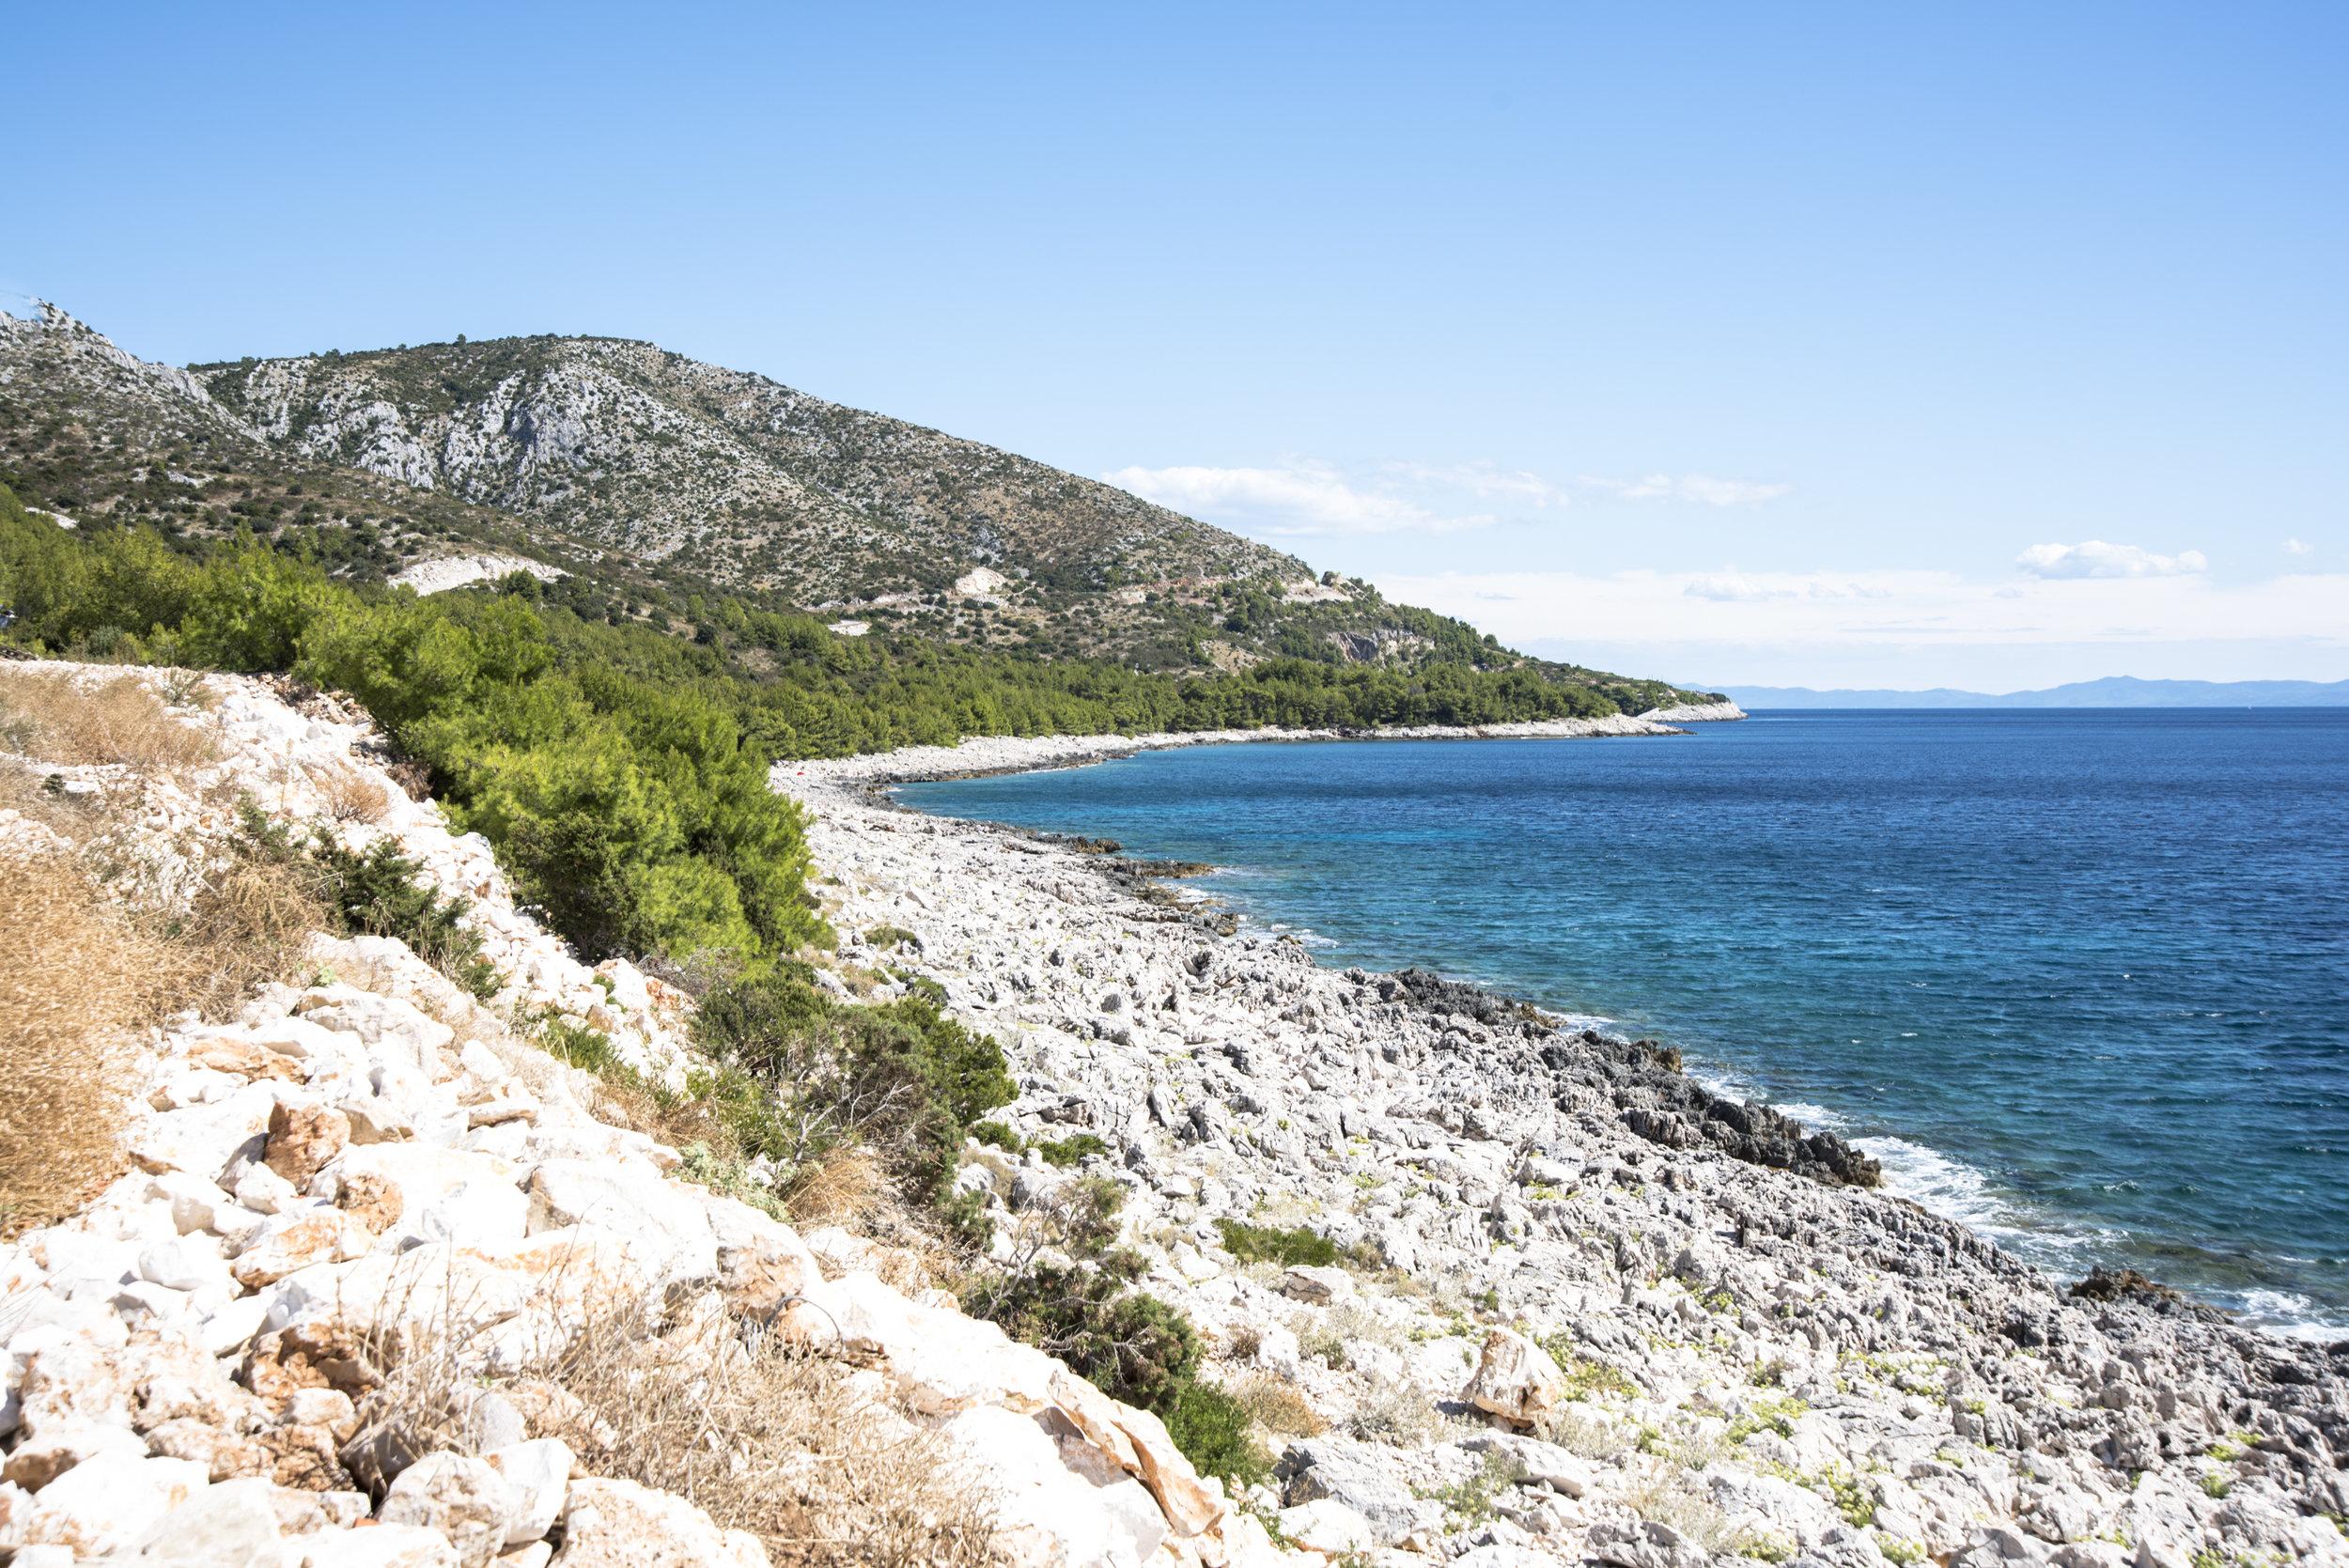 Bucht bei Milna (Insel Hvar)